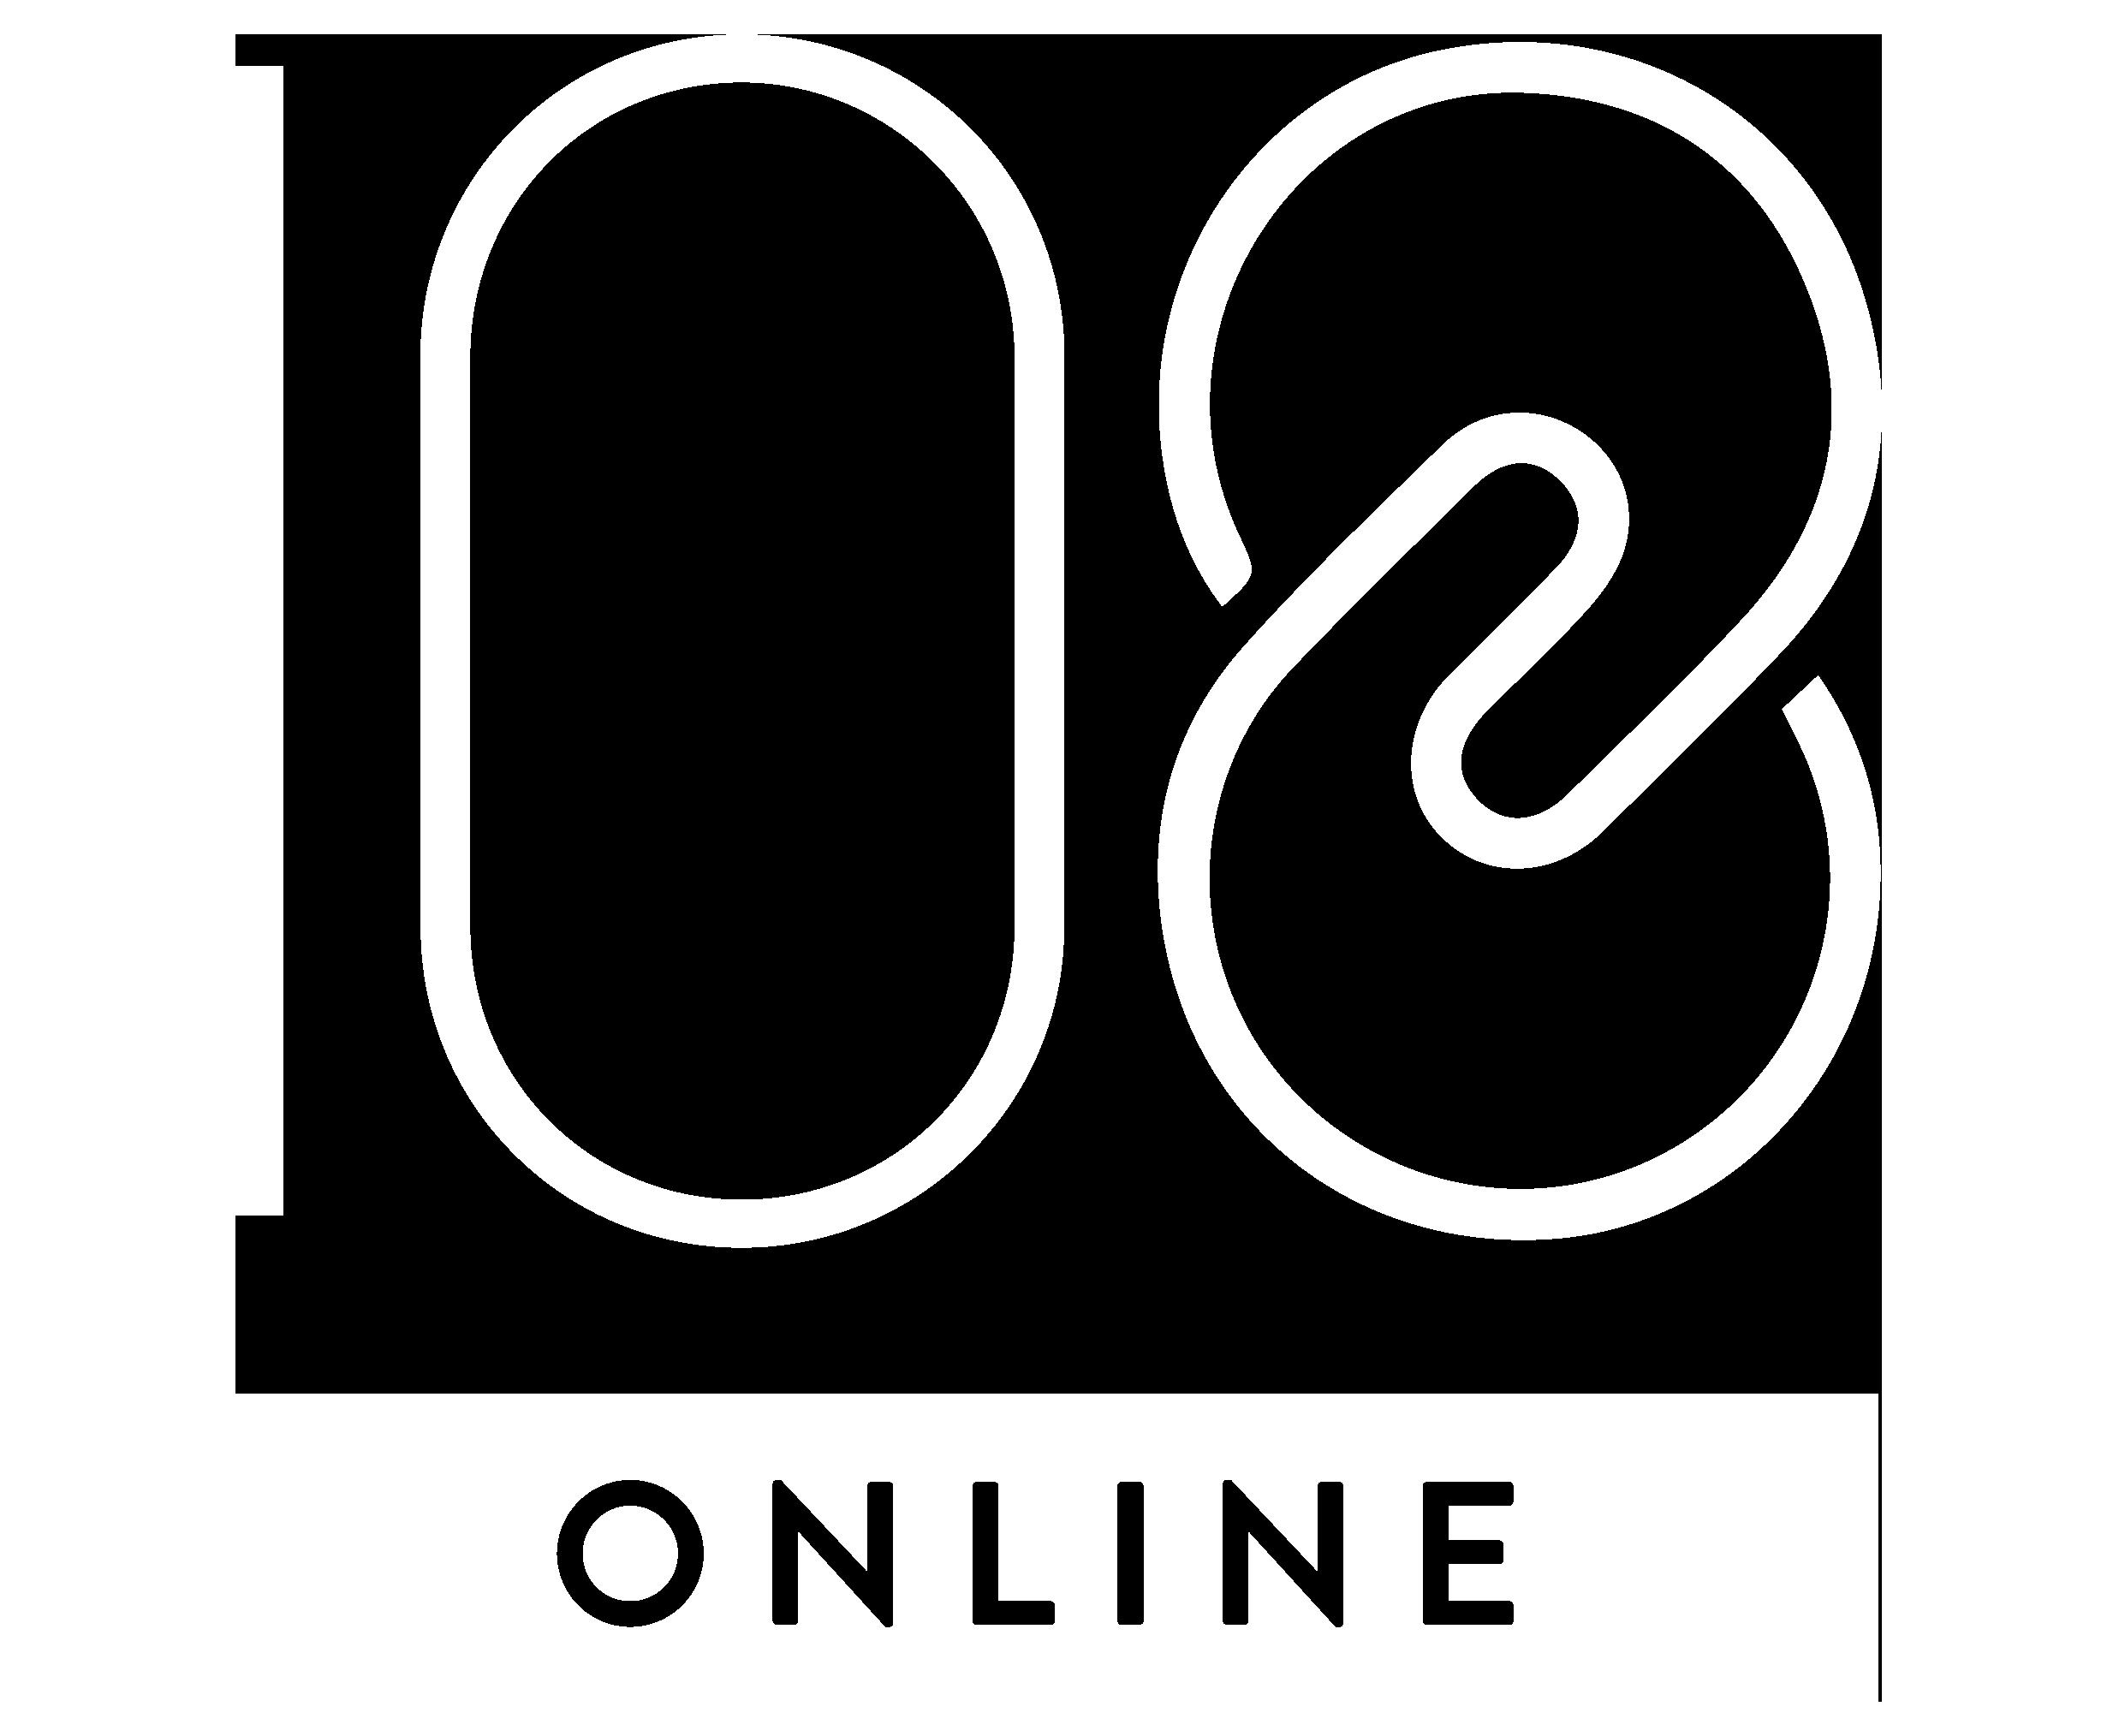 108onlinelogo